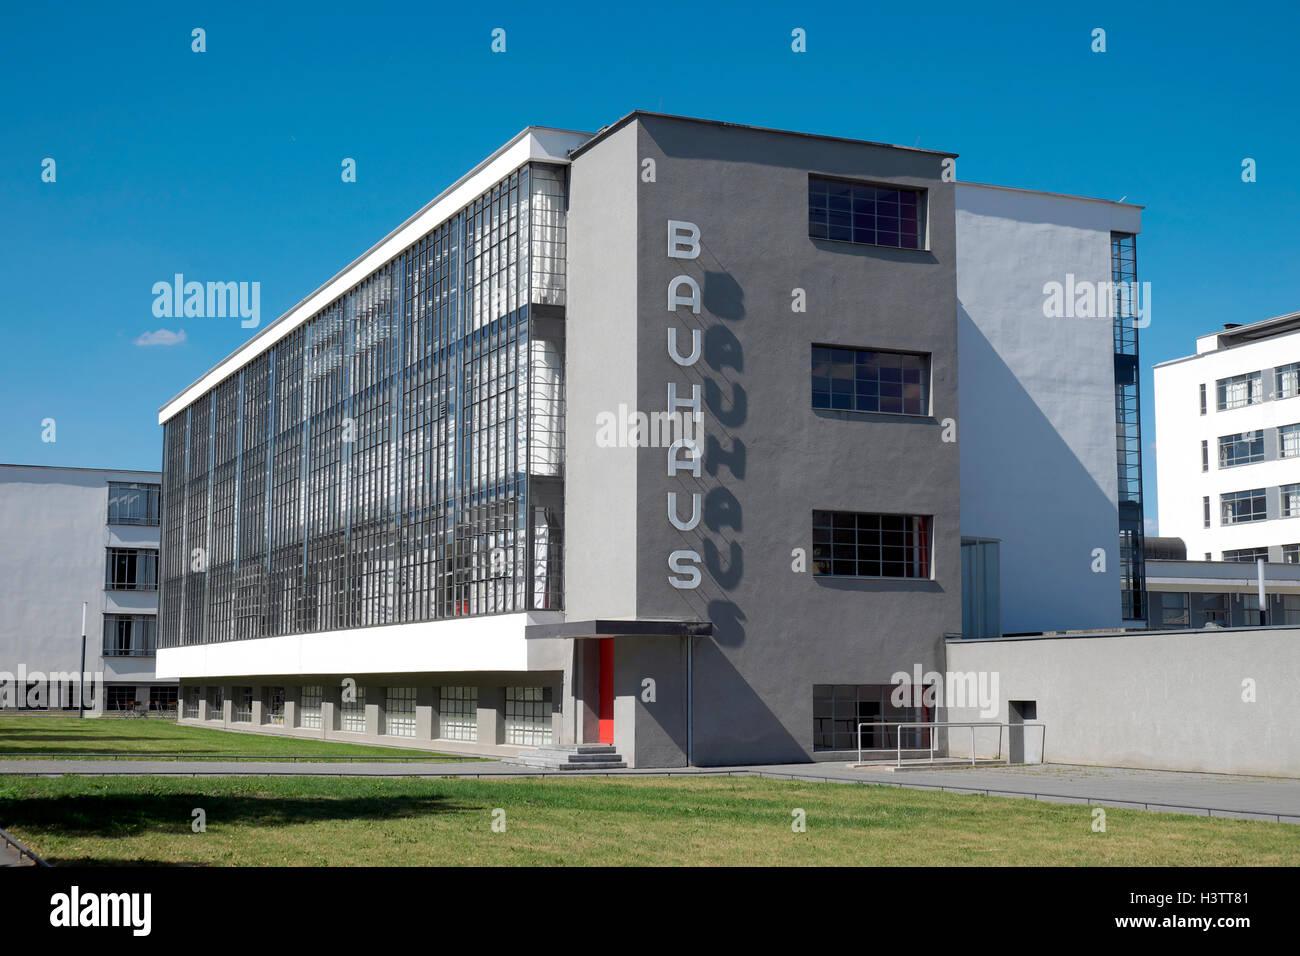 Bauhaus Dessau Stock Photos Bauhaus Dessau Stock Images